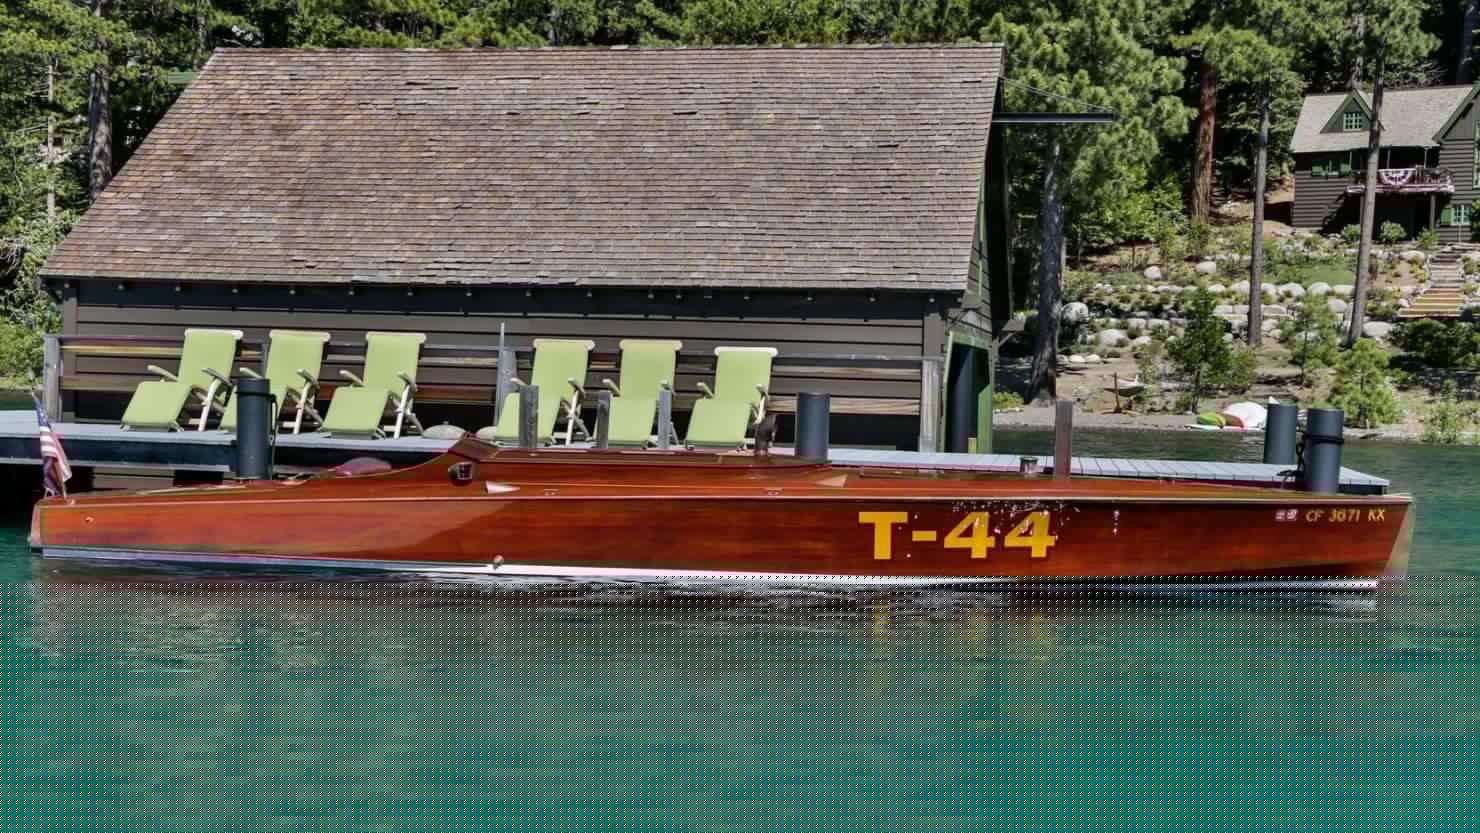 mahogany speed boat 11 1480x833 - 27 Liter V12 Brown & Bassett Gentleman's Racer